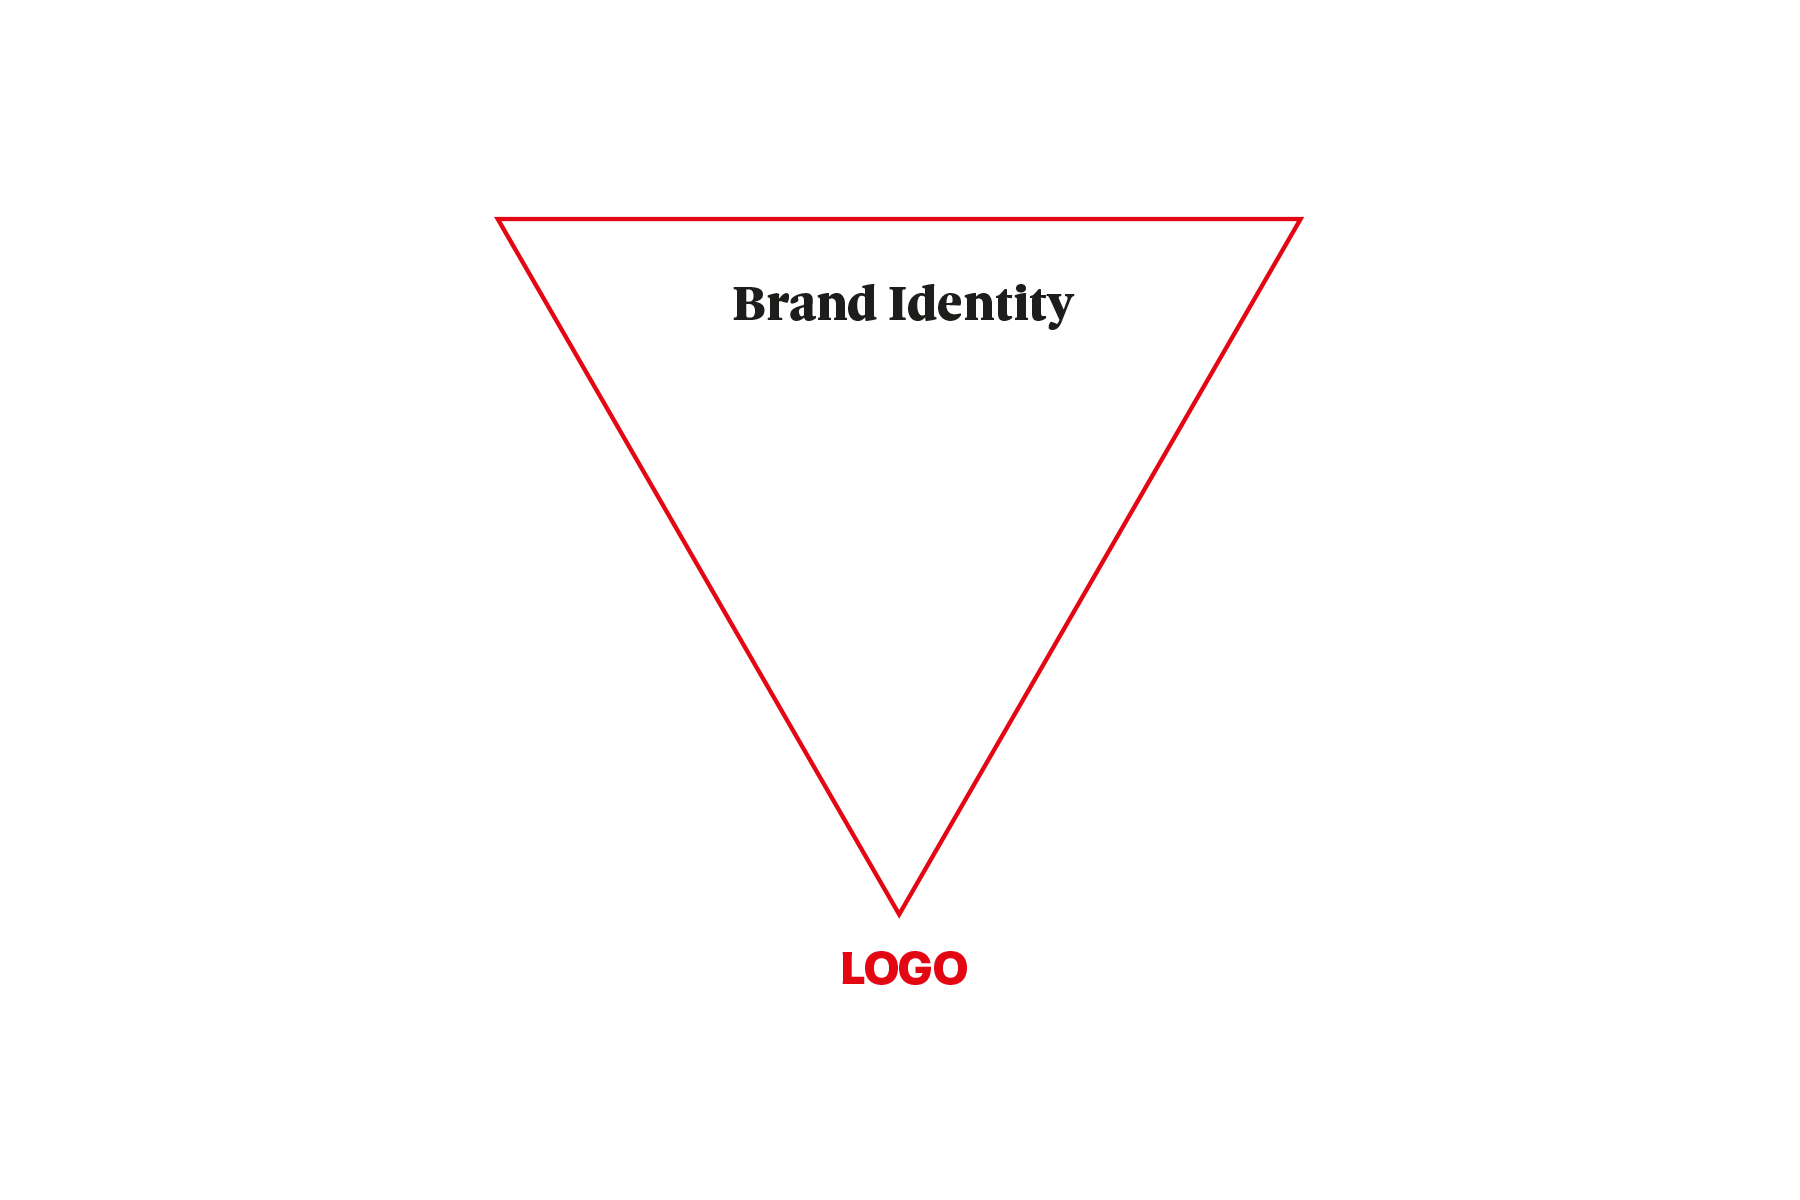 Piramide brand identity-logo rovesciata